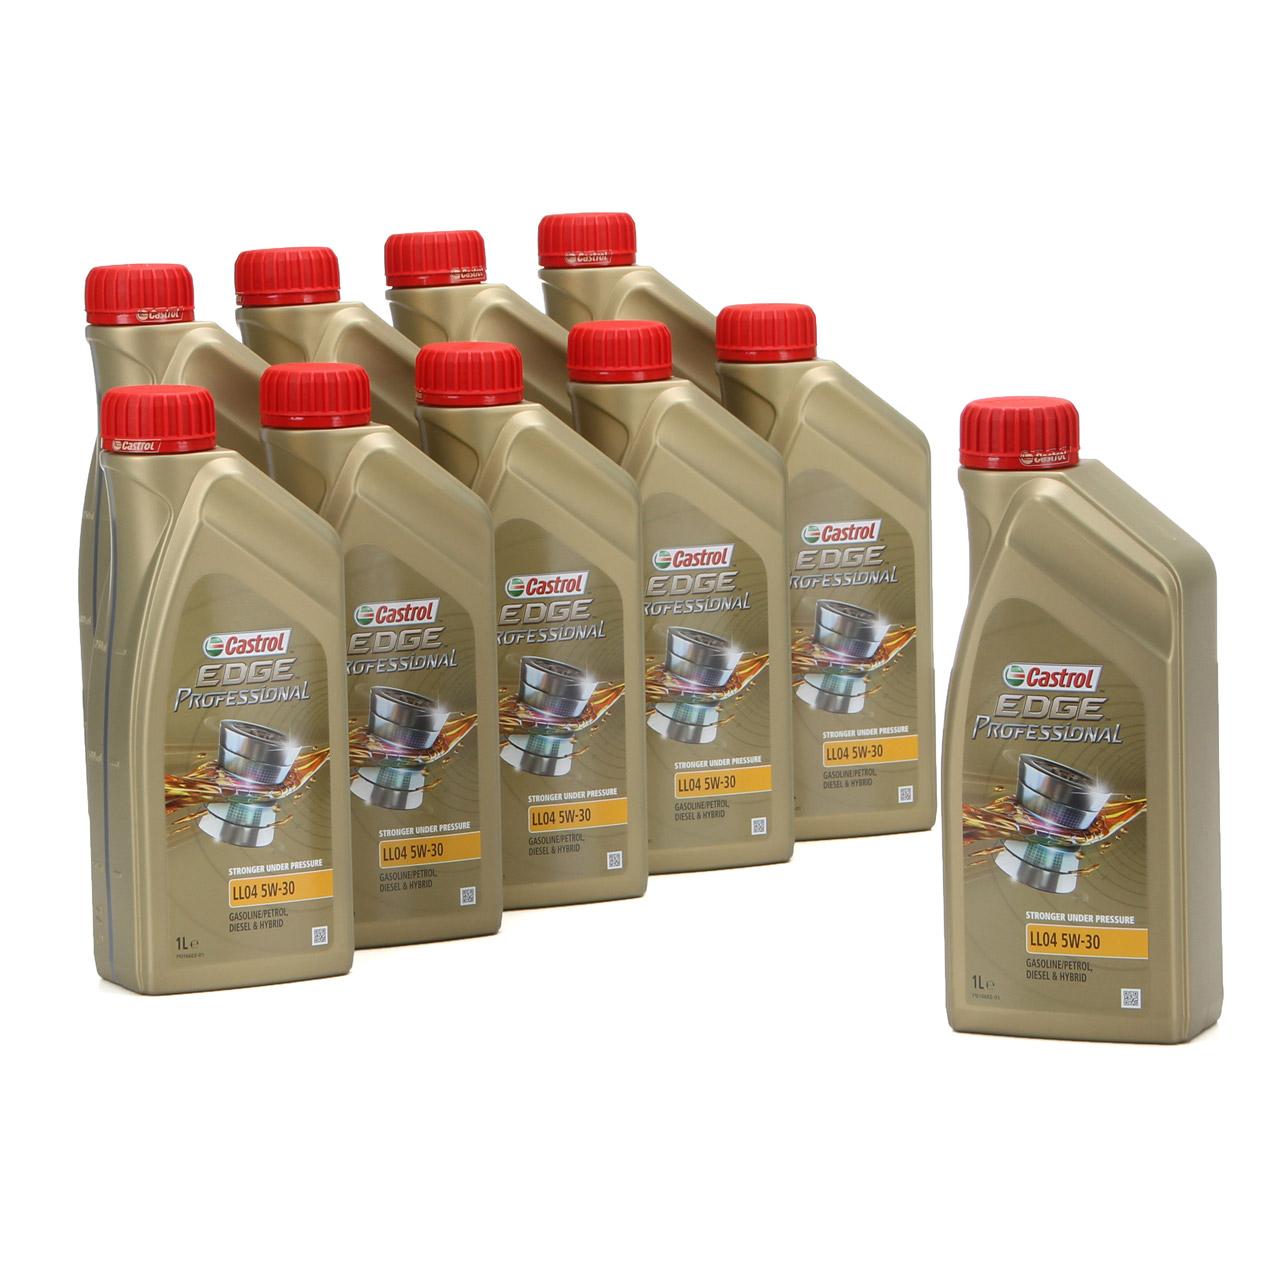 CASTROL EDGE Professional Motoröl Öl für BMW Longlife IV LL04 5W-30 - 10 Liter